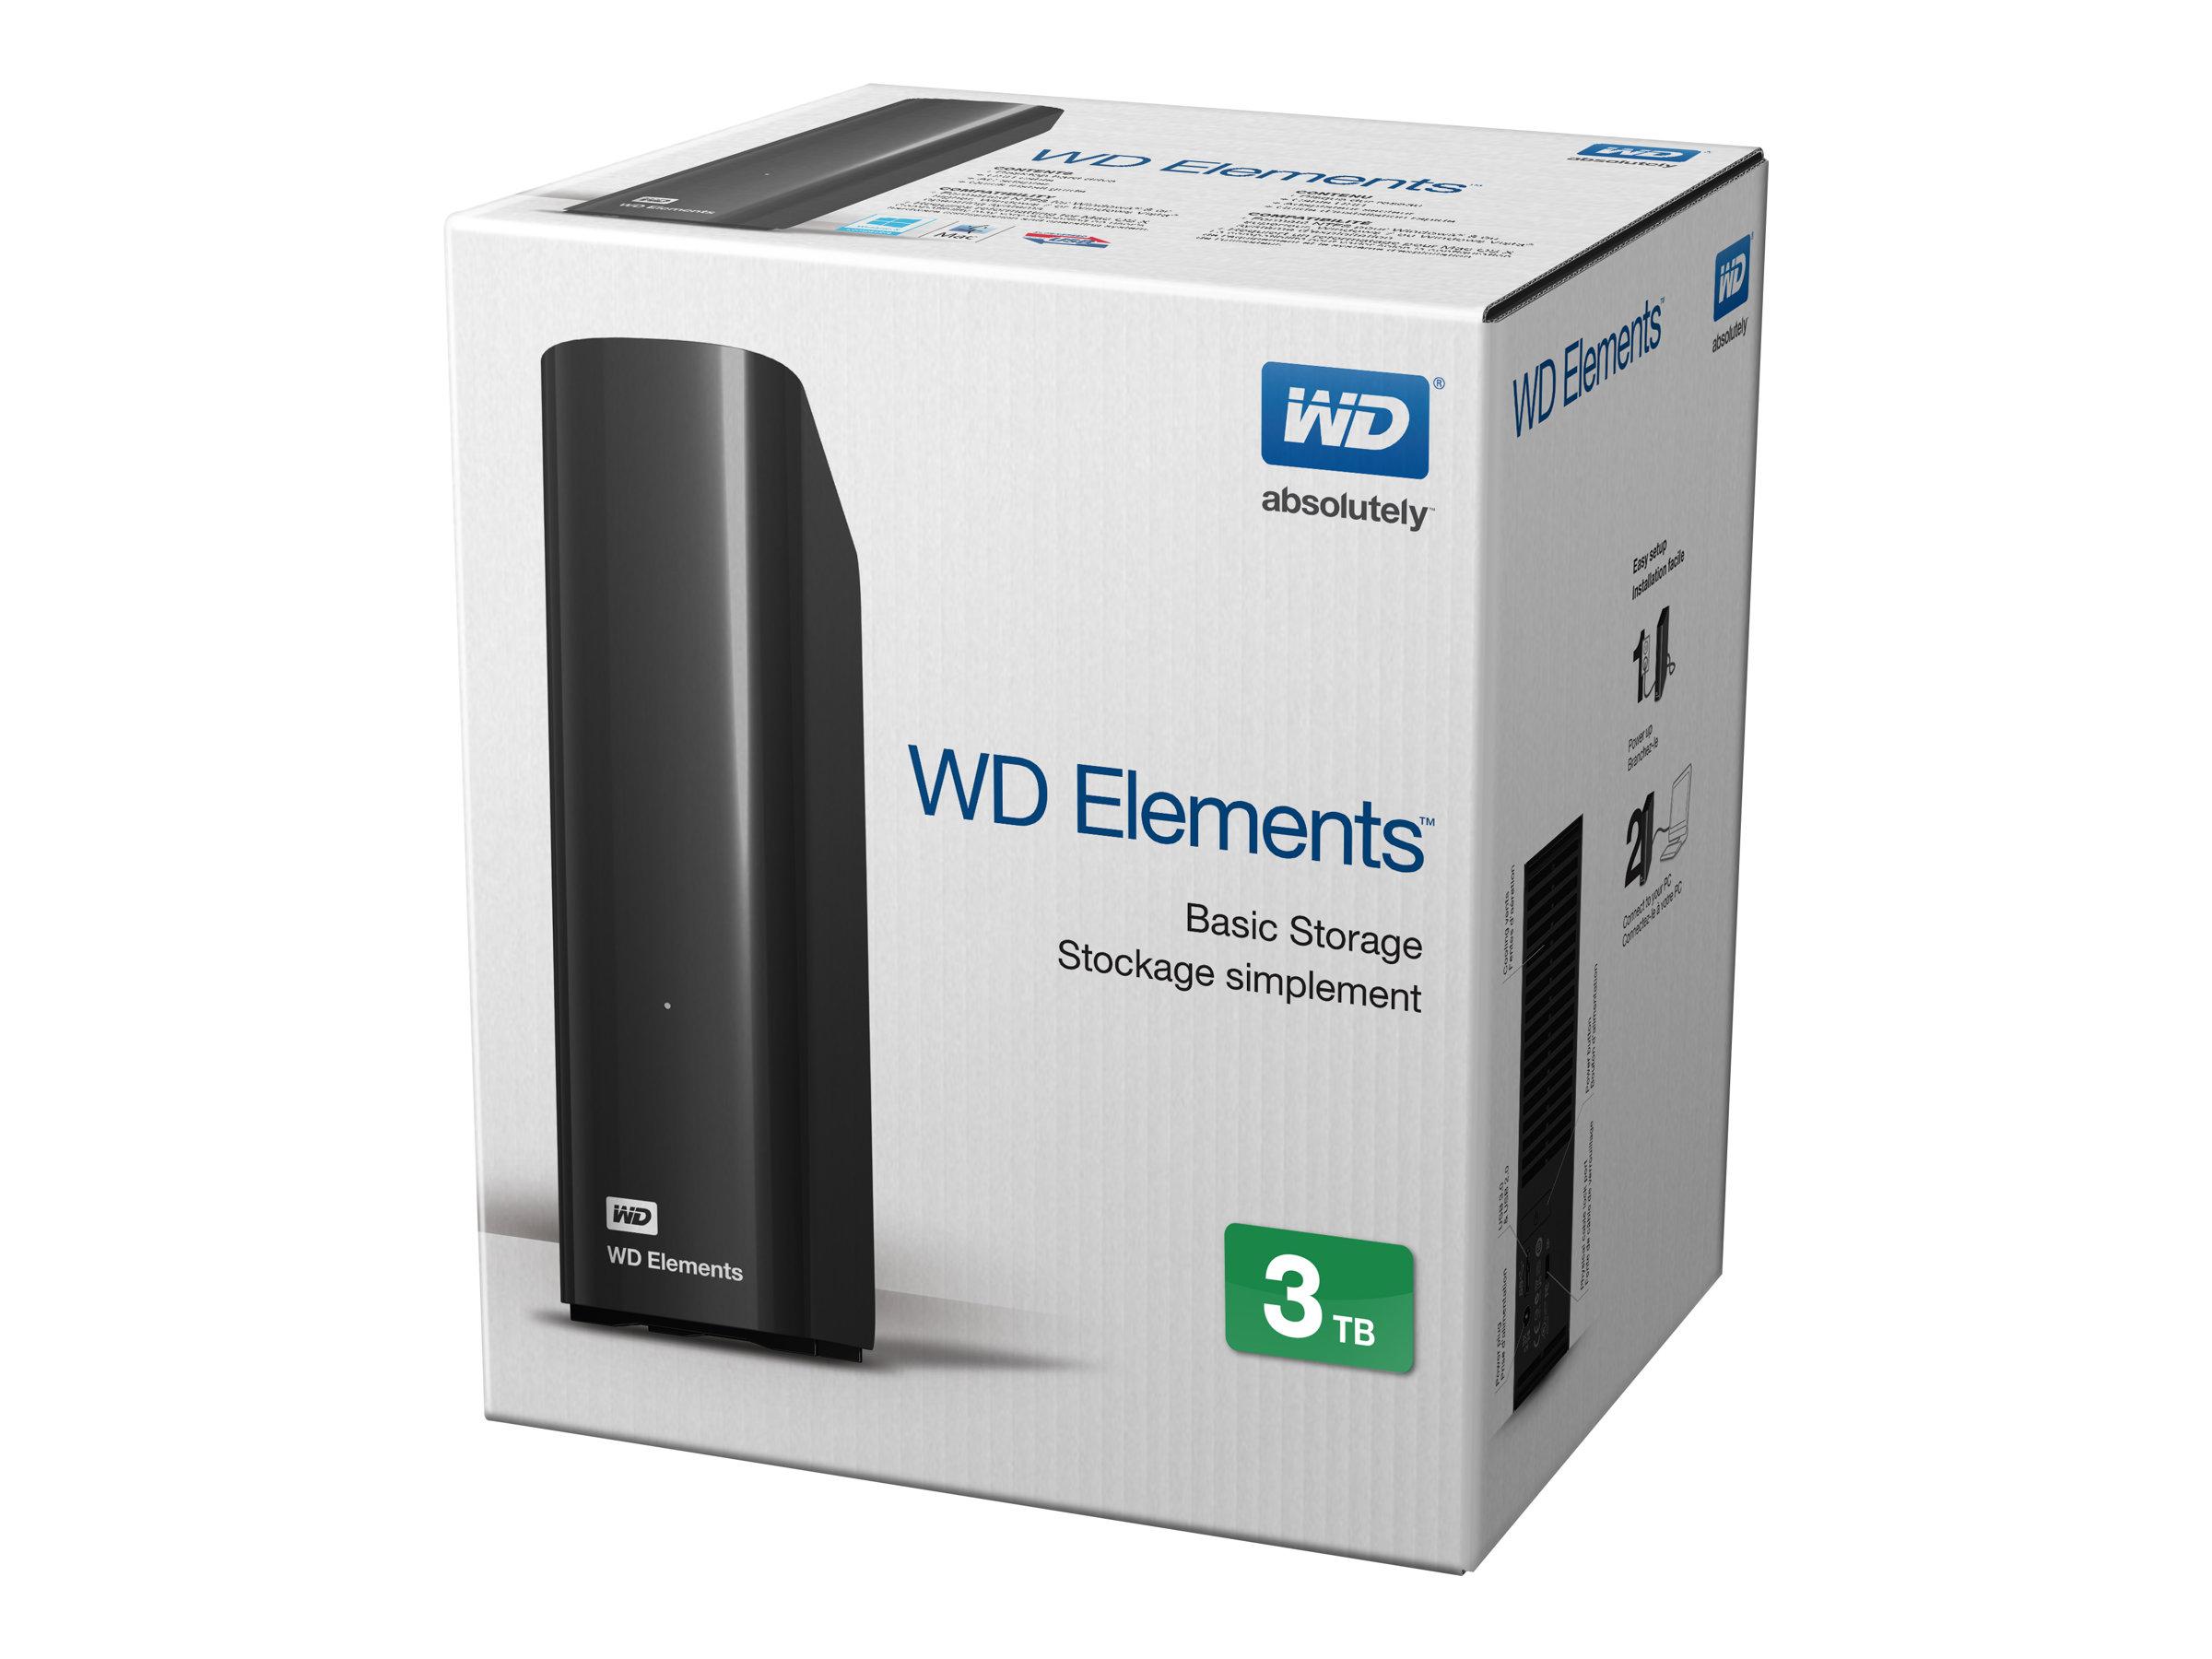 wd smartware pro key torrent